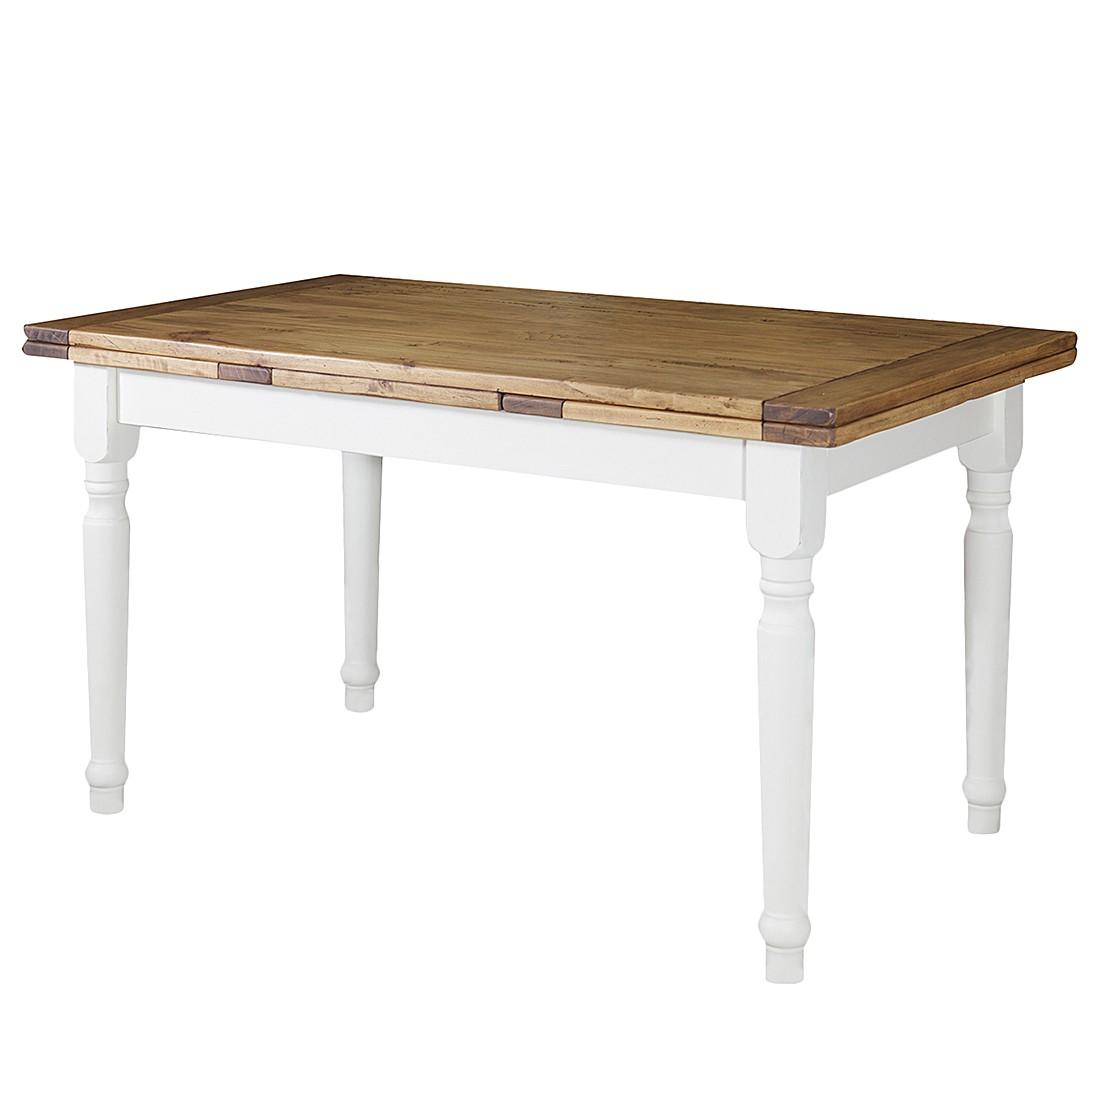 Meubles salle manger tables de salle manger le for Table salle a manger 80 cm largeur